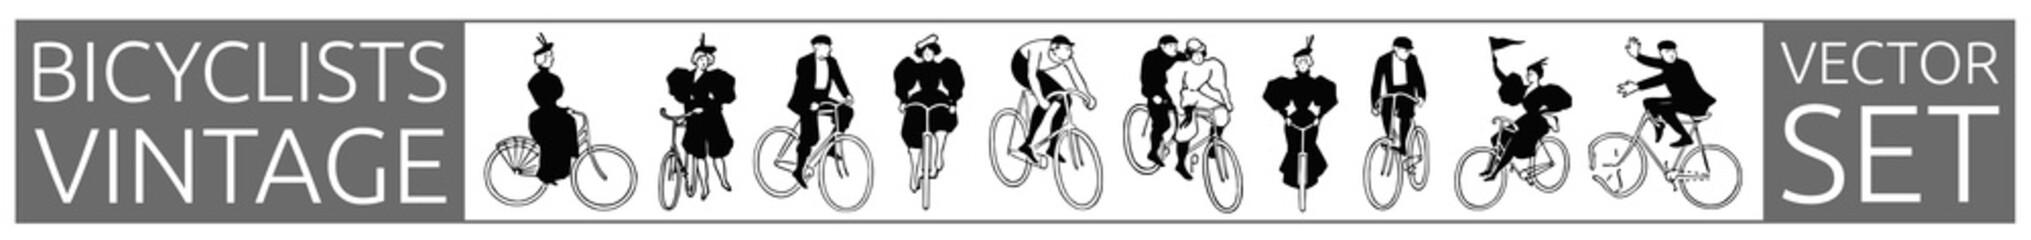 bicyclists vintage historic set #vector